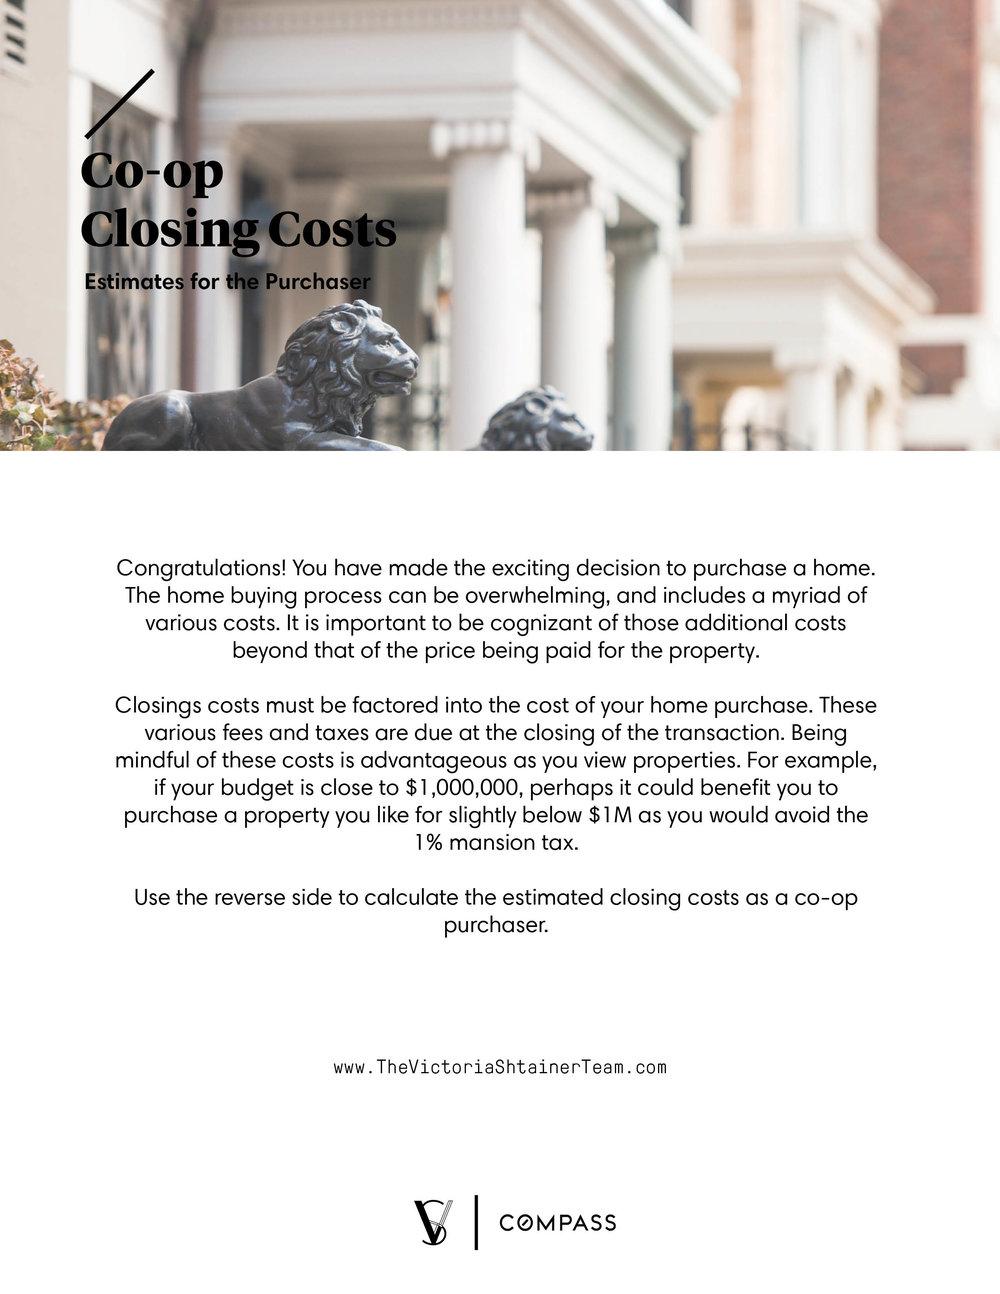 Co-Op Closing Cost Estimator